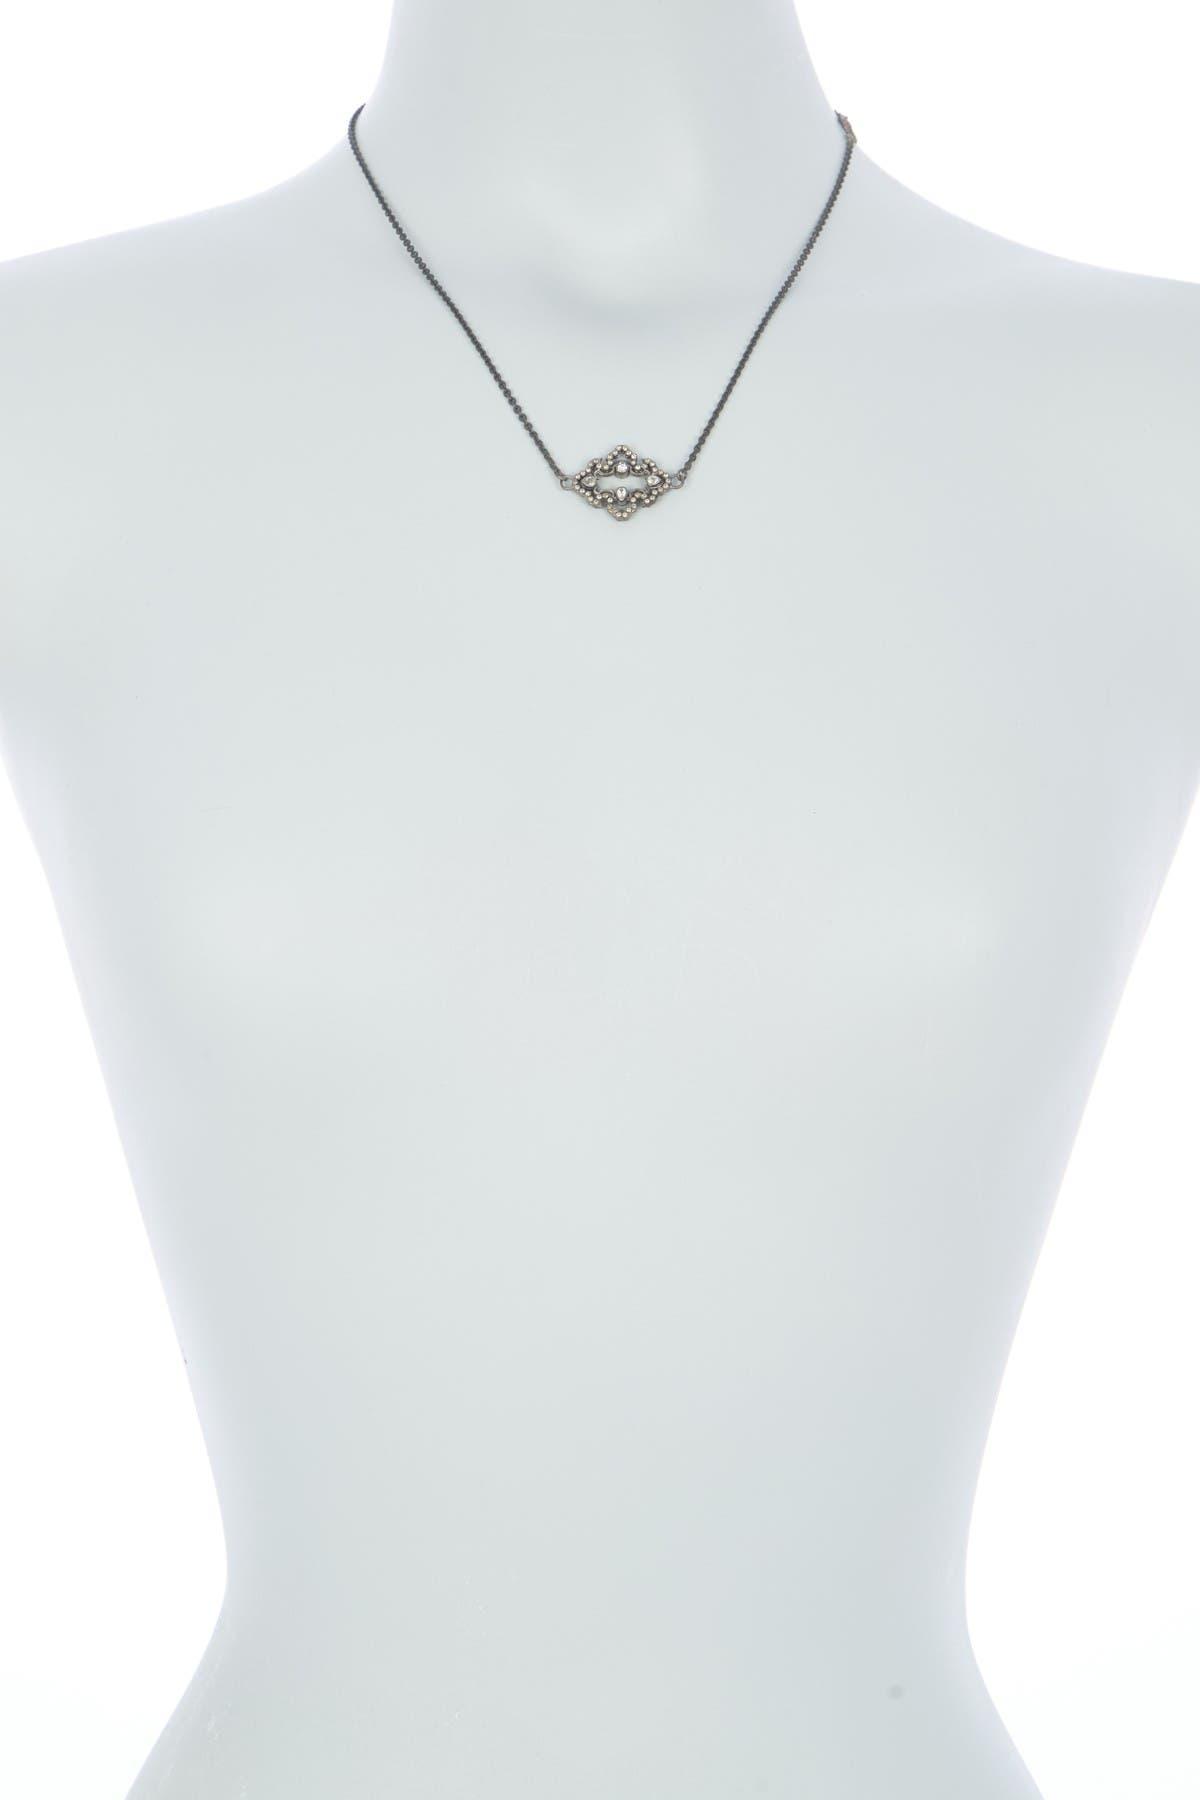 Image of ARMENTA Old World All Midnight Diamond Pendant Necklace - 0.37 ctw